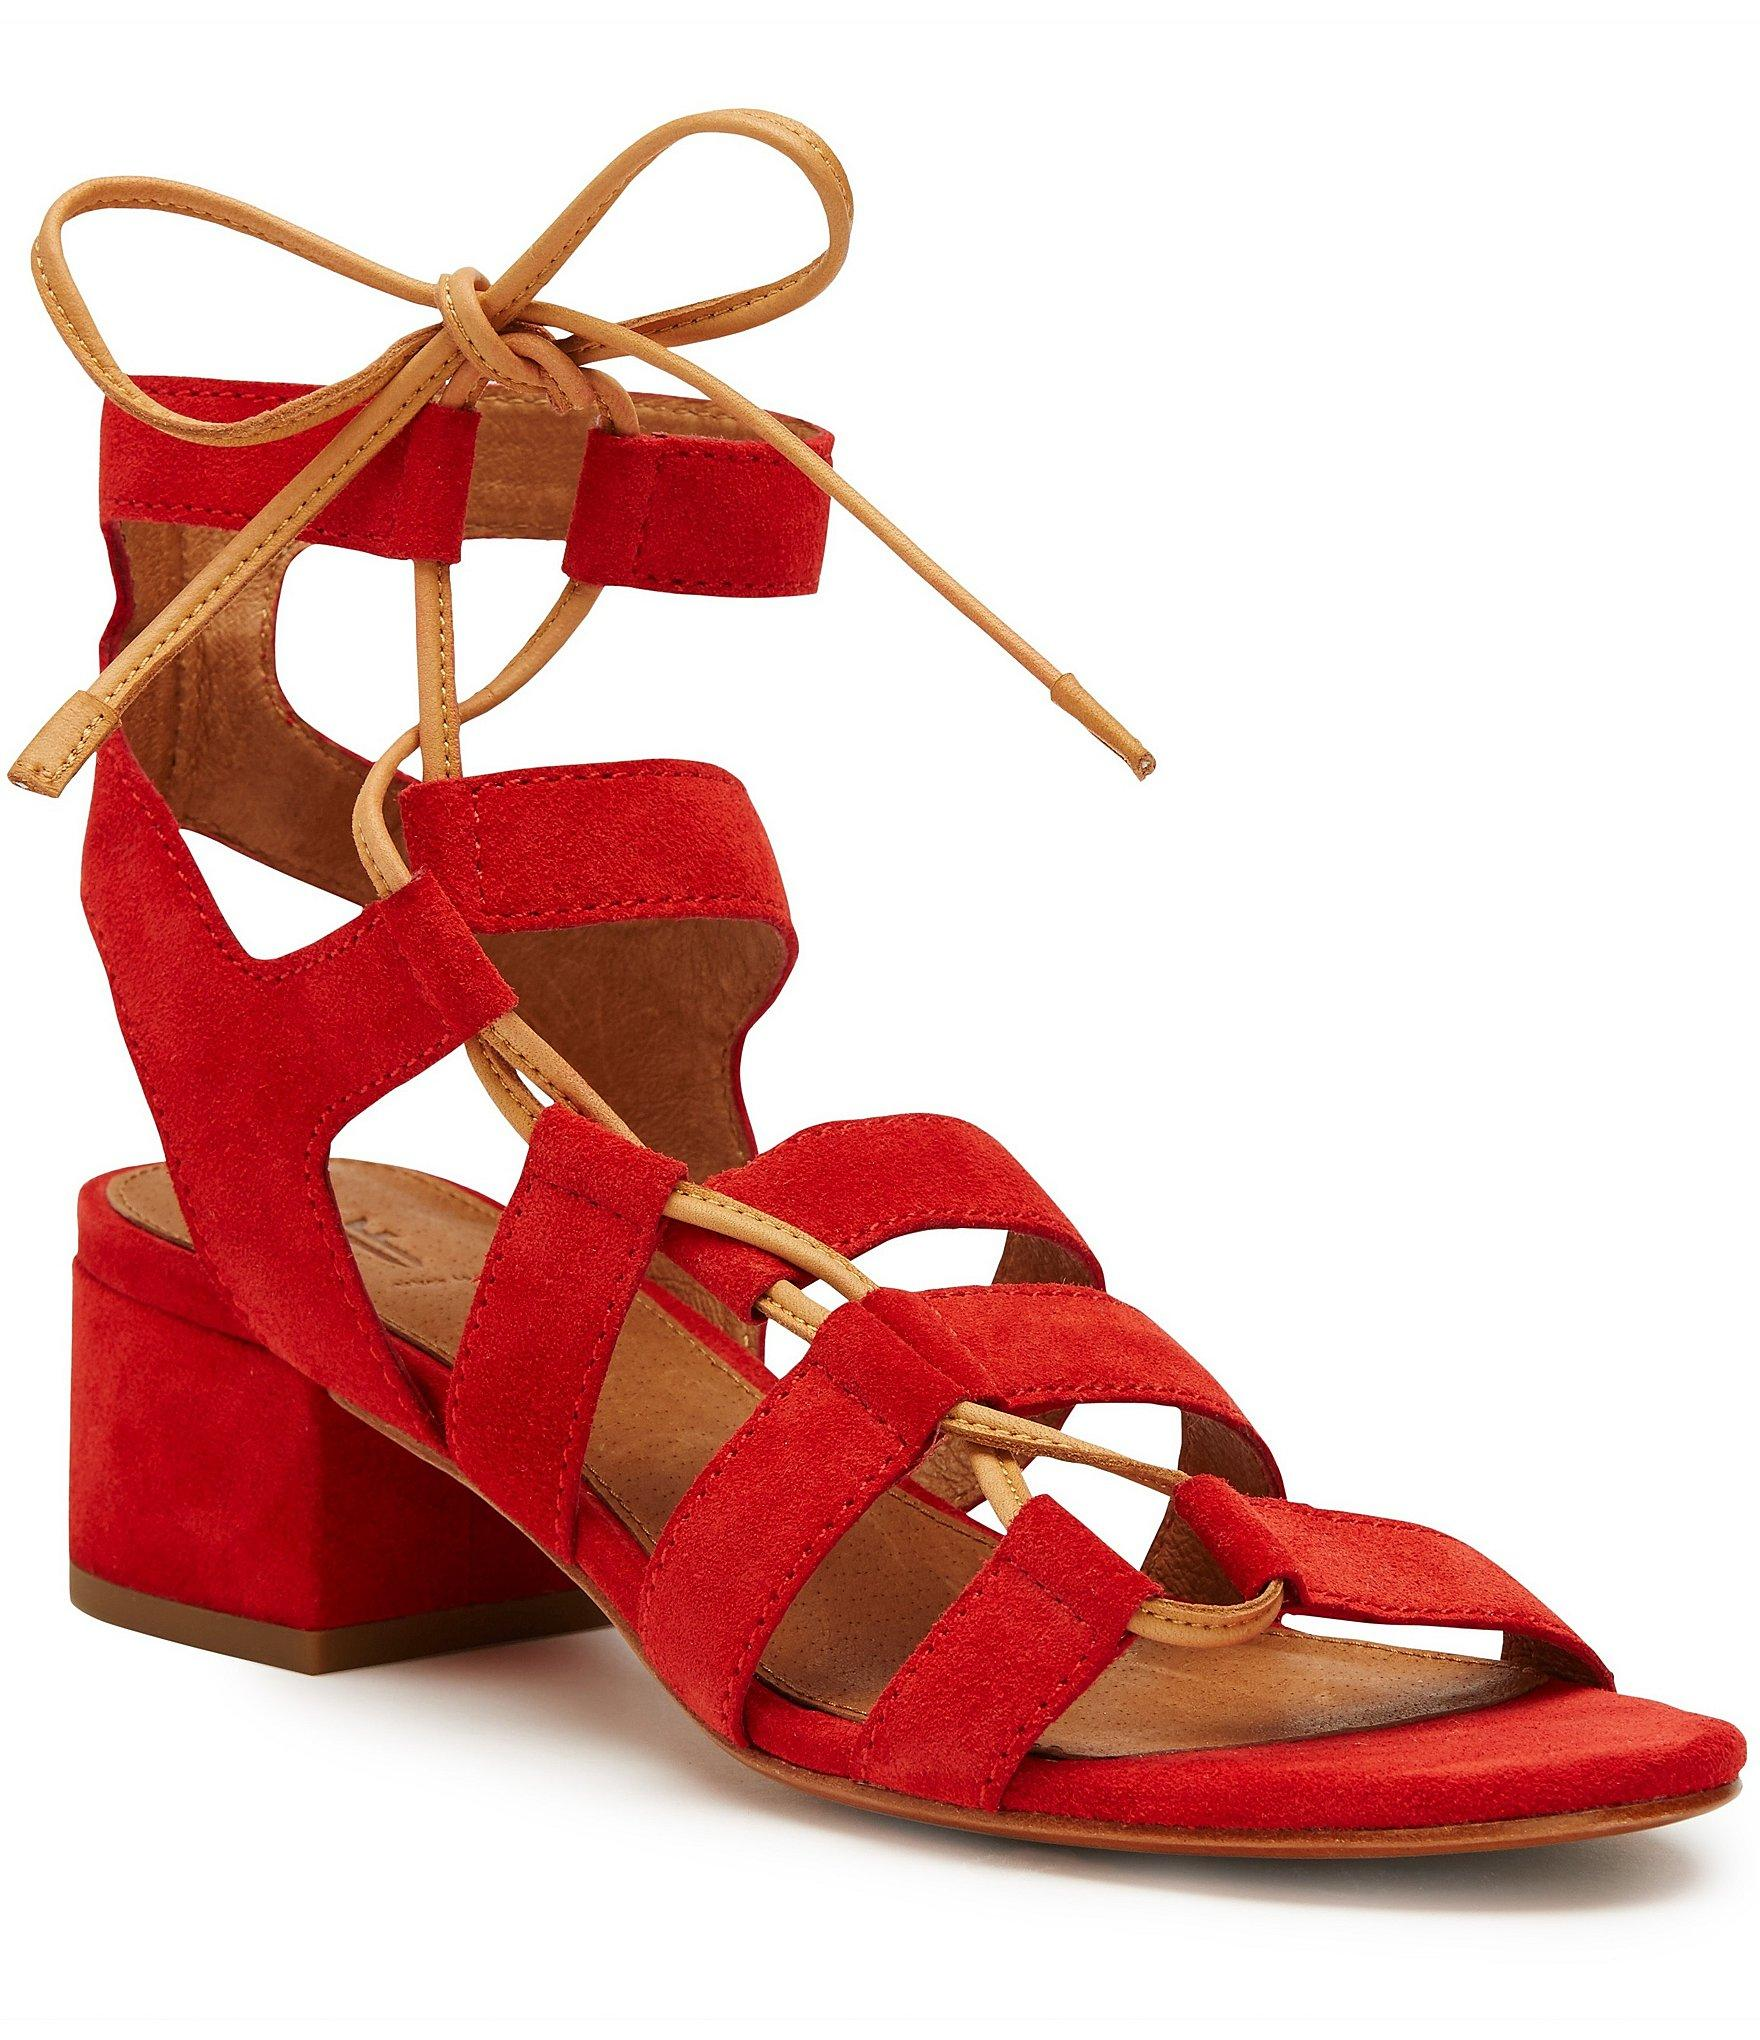 66493d683c735 Lyst - Frye Chrissy Suede Side Ghillie Block Heel Sandals in Red